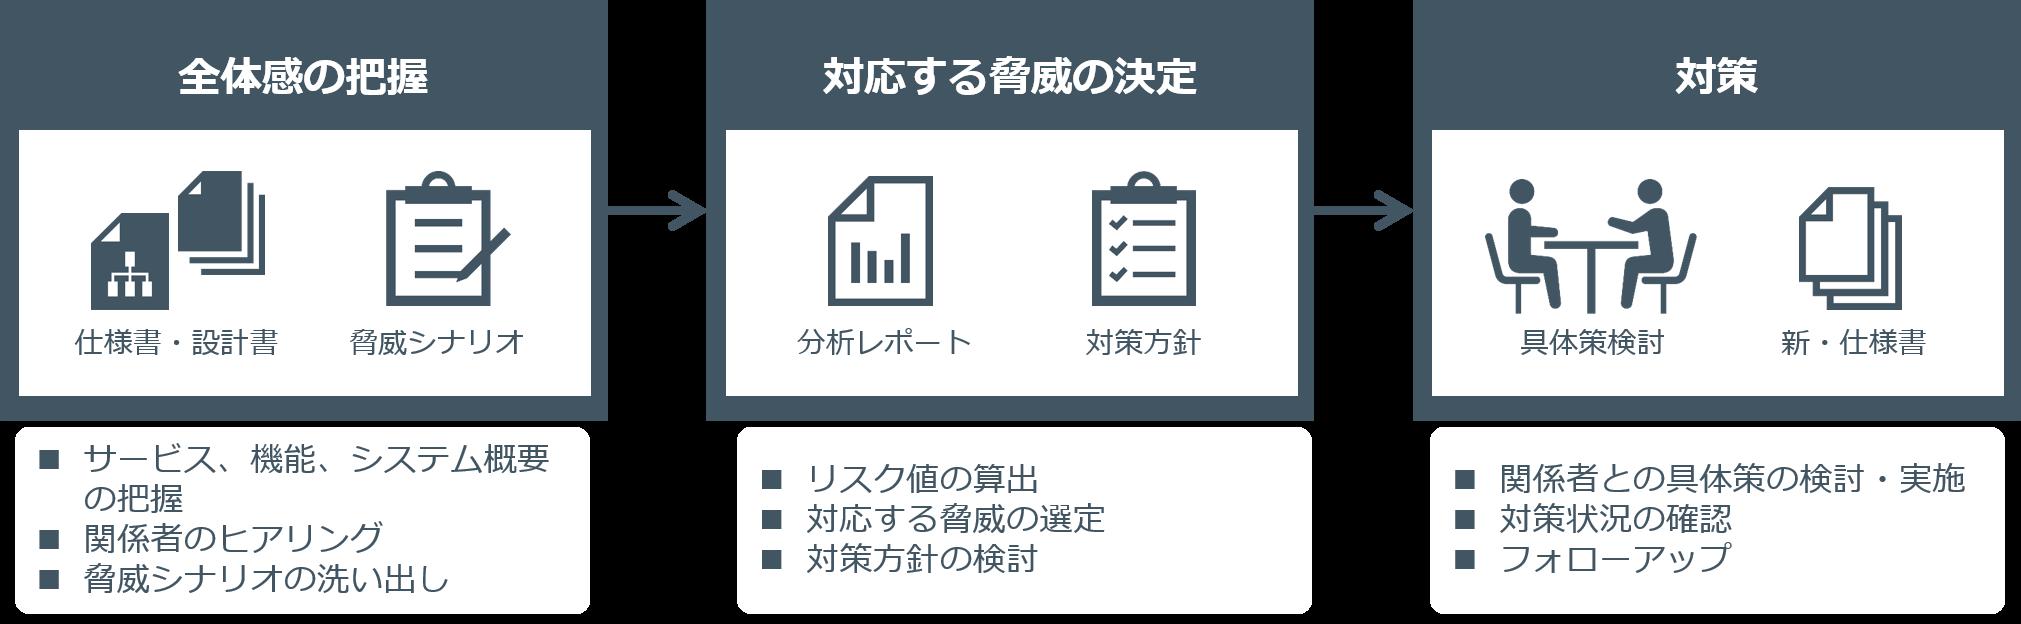 Secure SketCH_デジタルサービスリスク分析プロセス